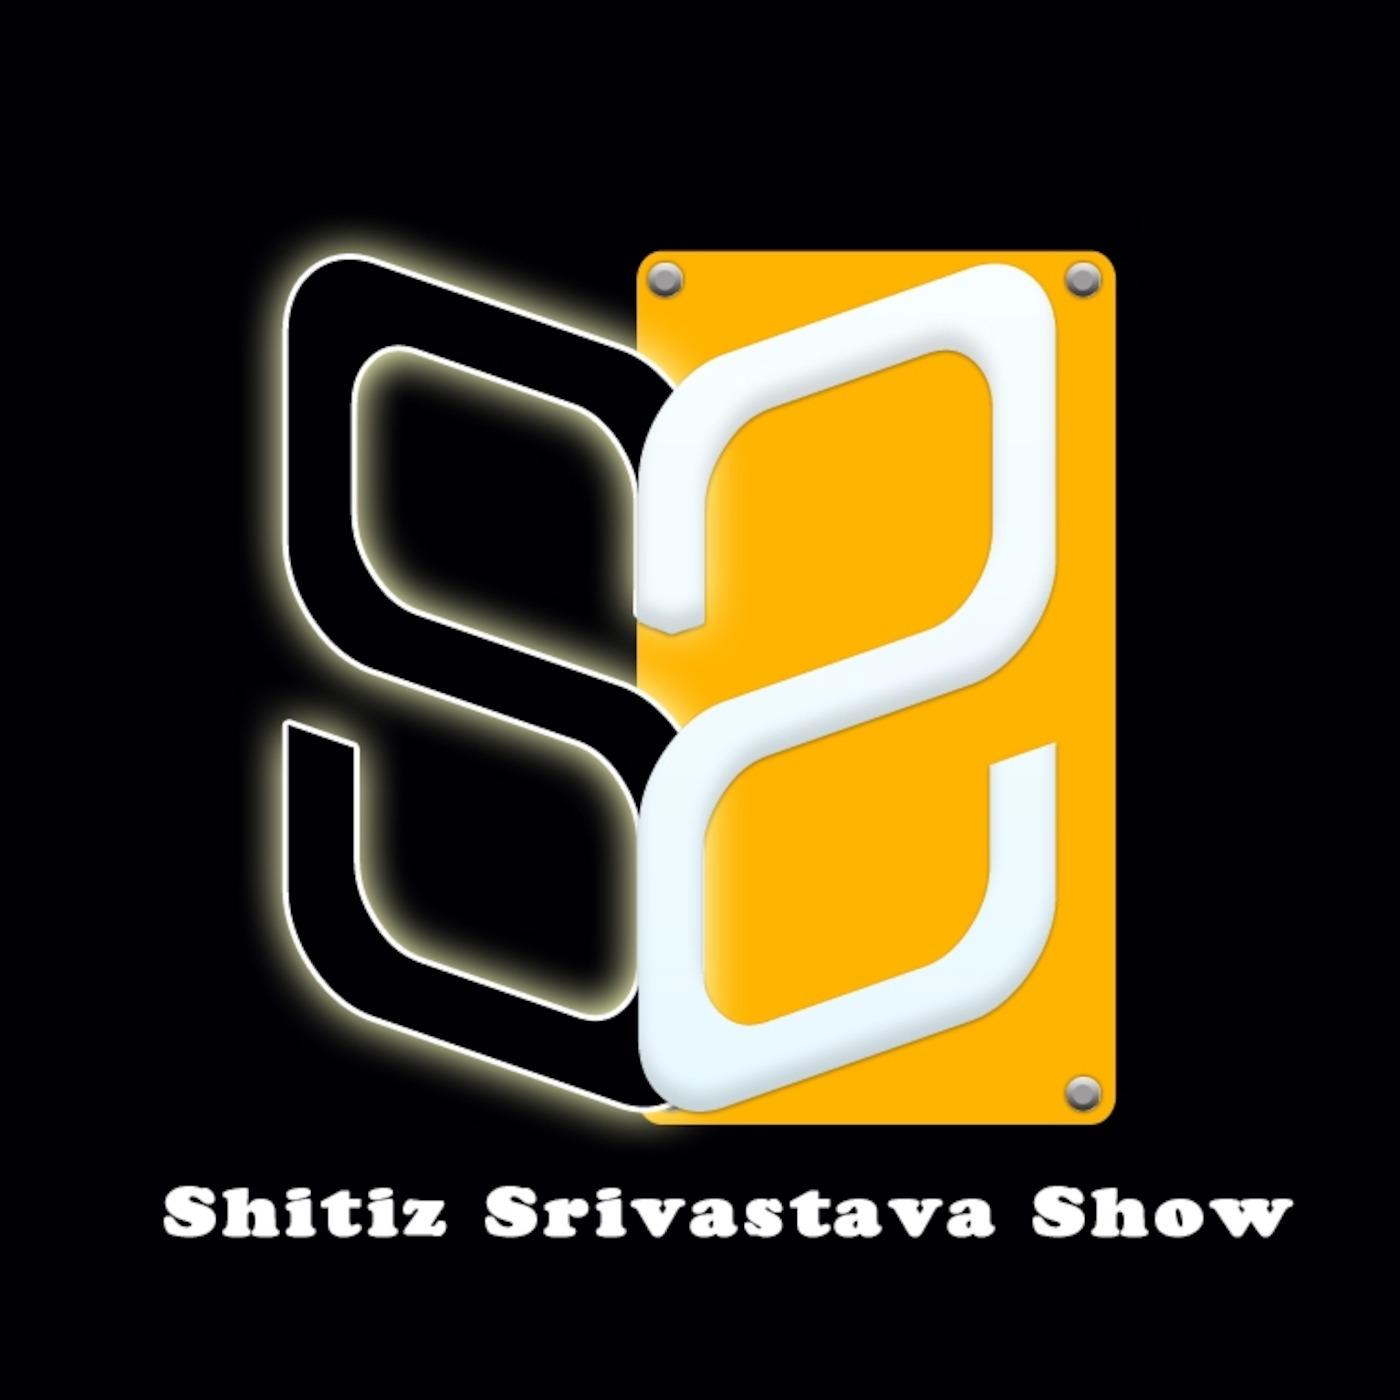 Shitiz Srivastava's Podcast